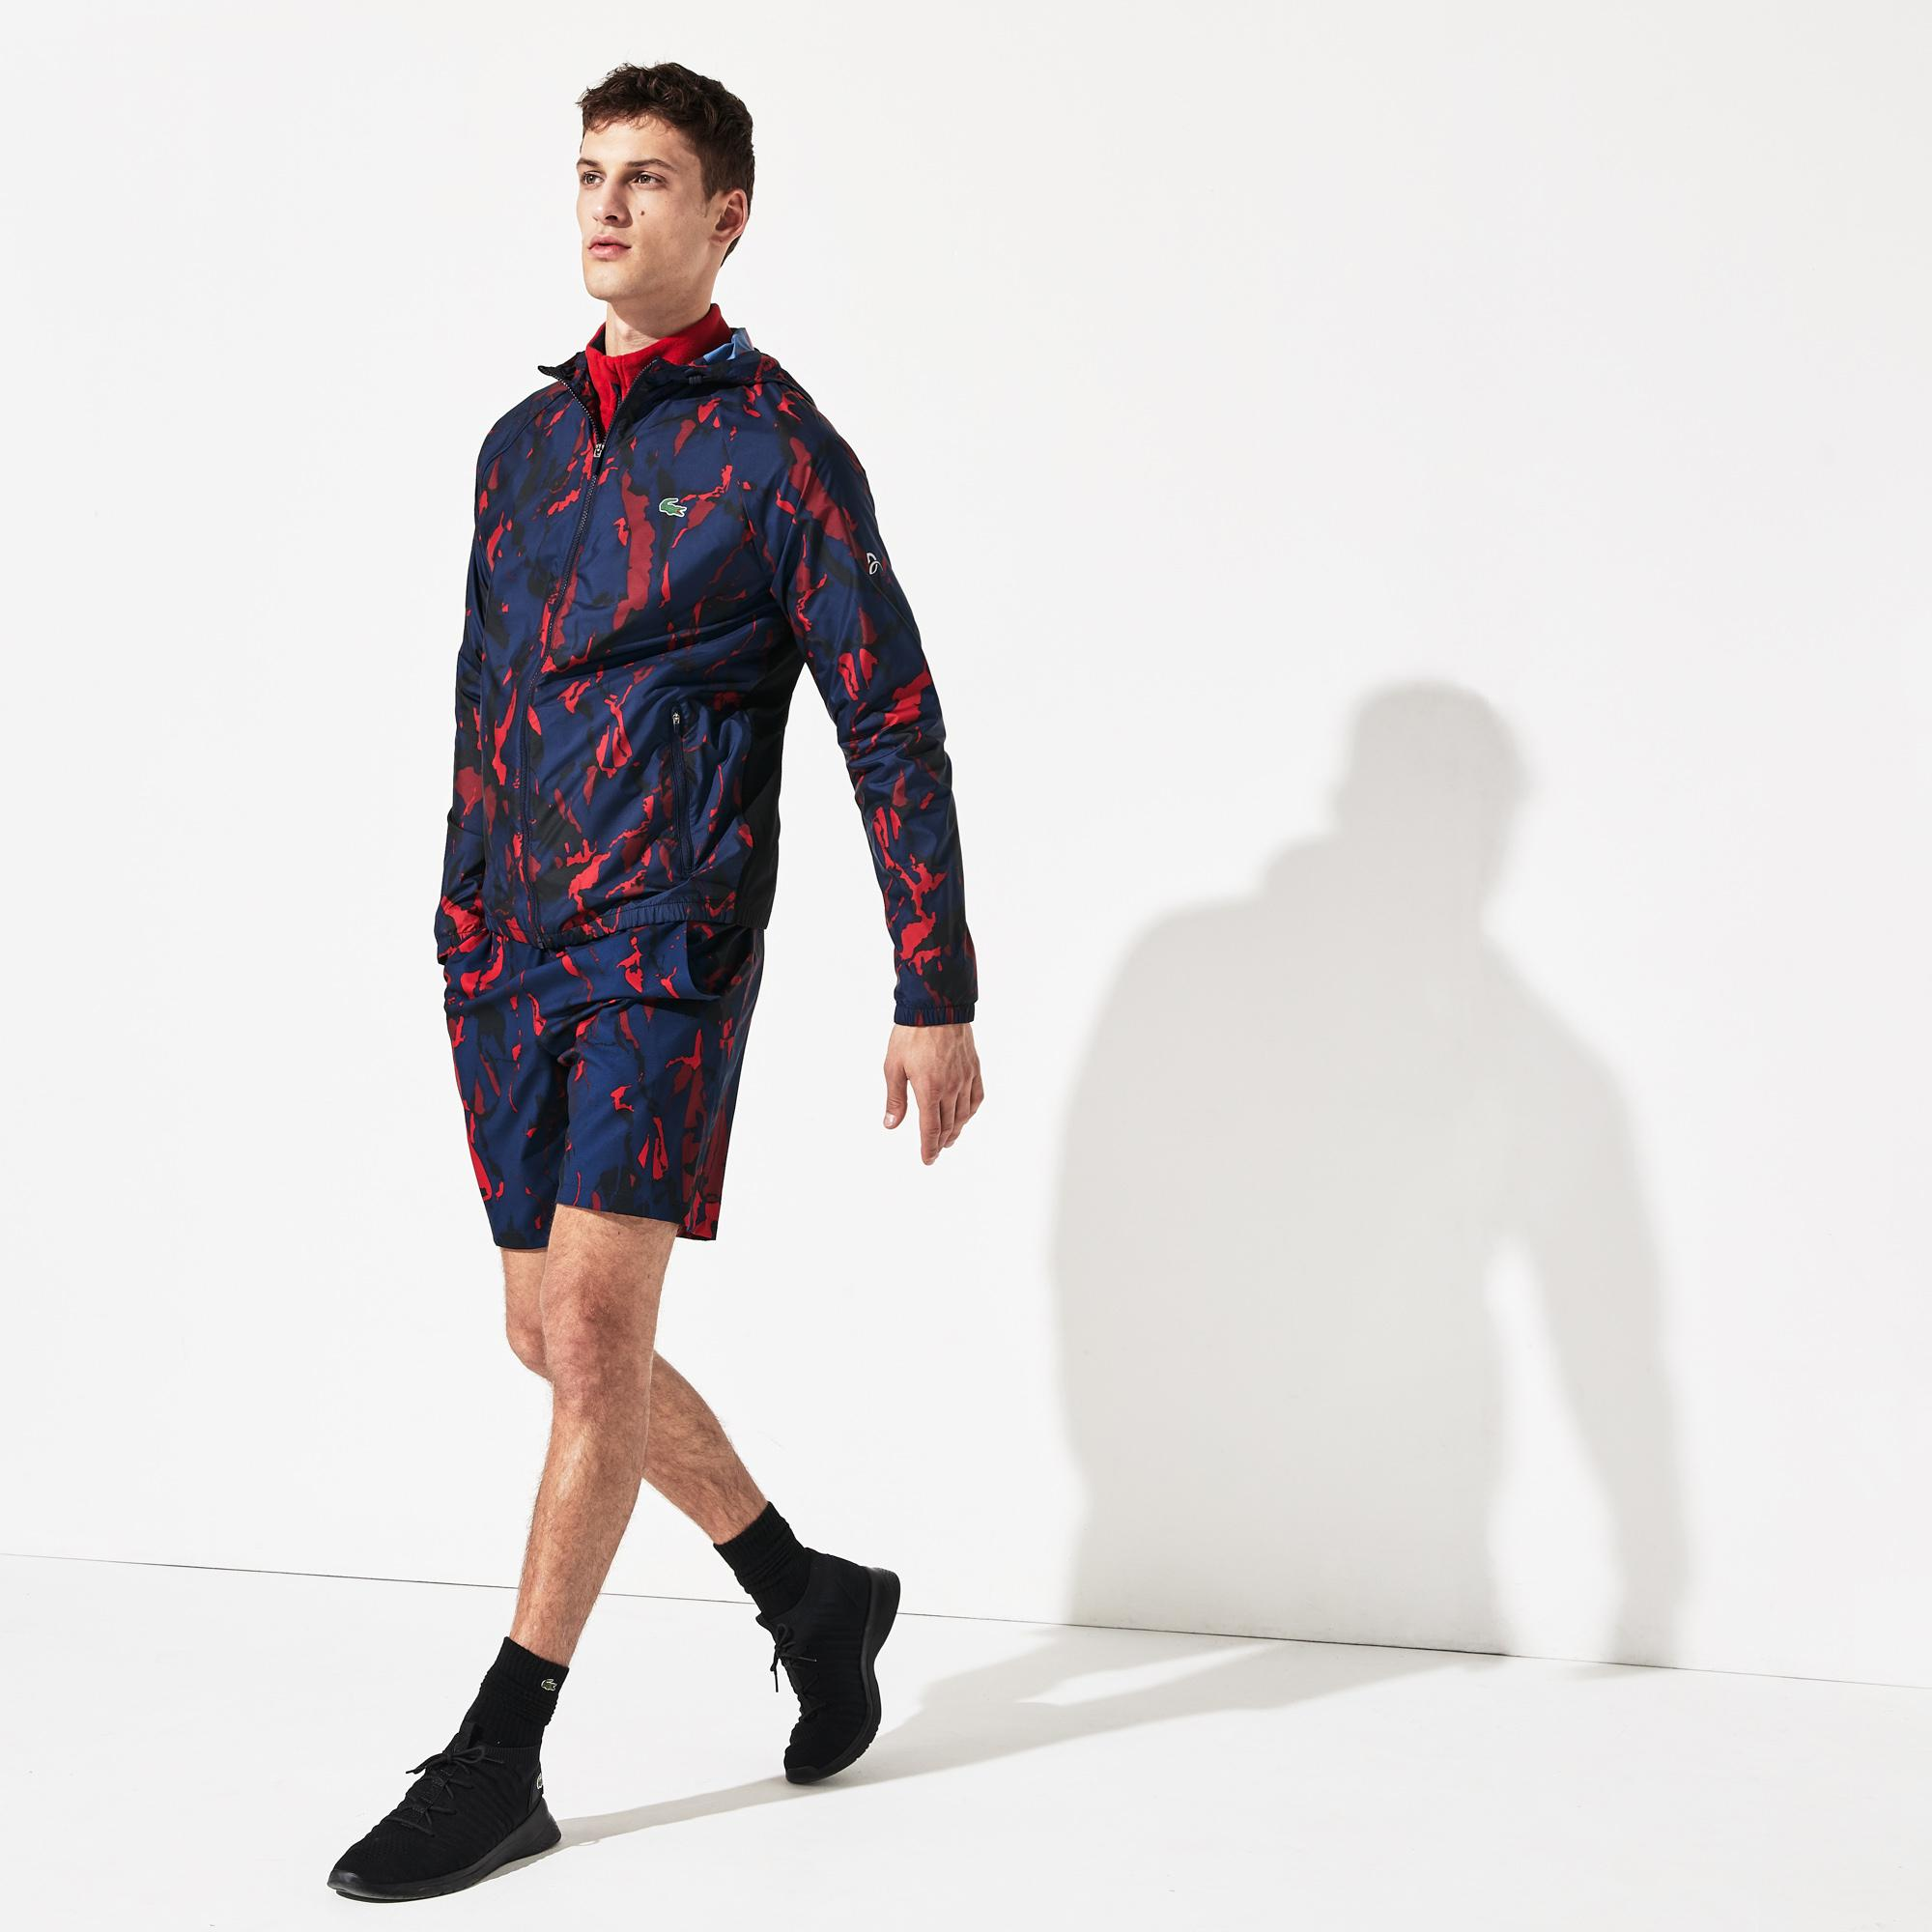 Lacoste Novak Djokovic Erkek Desenli Lacivert Mont